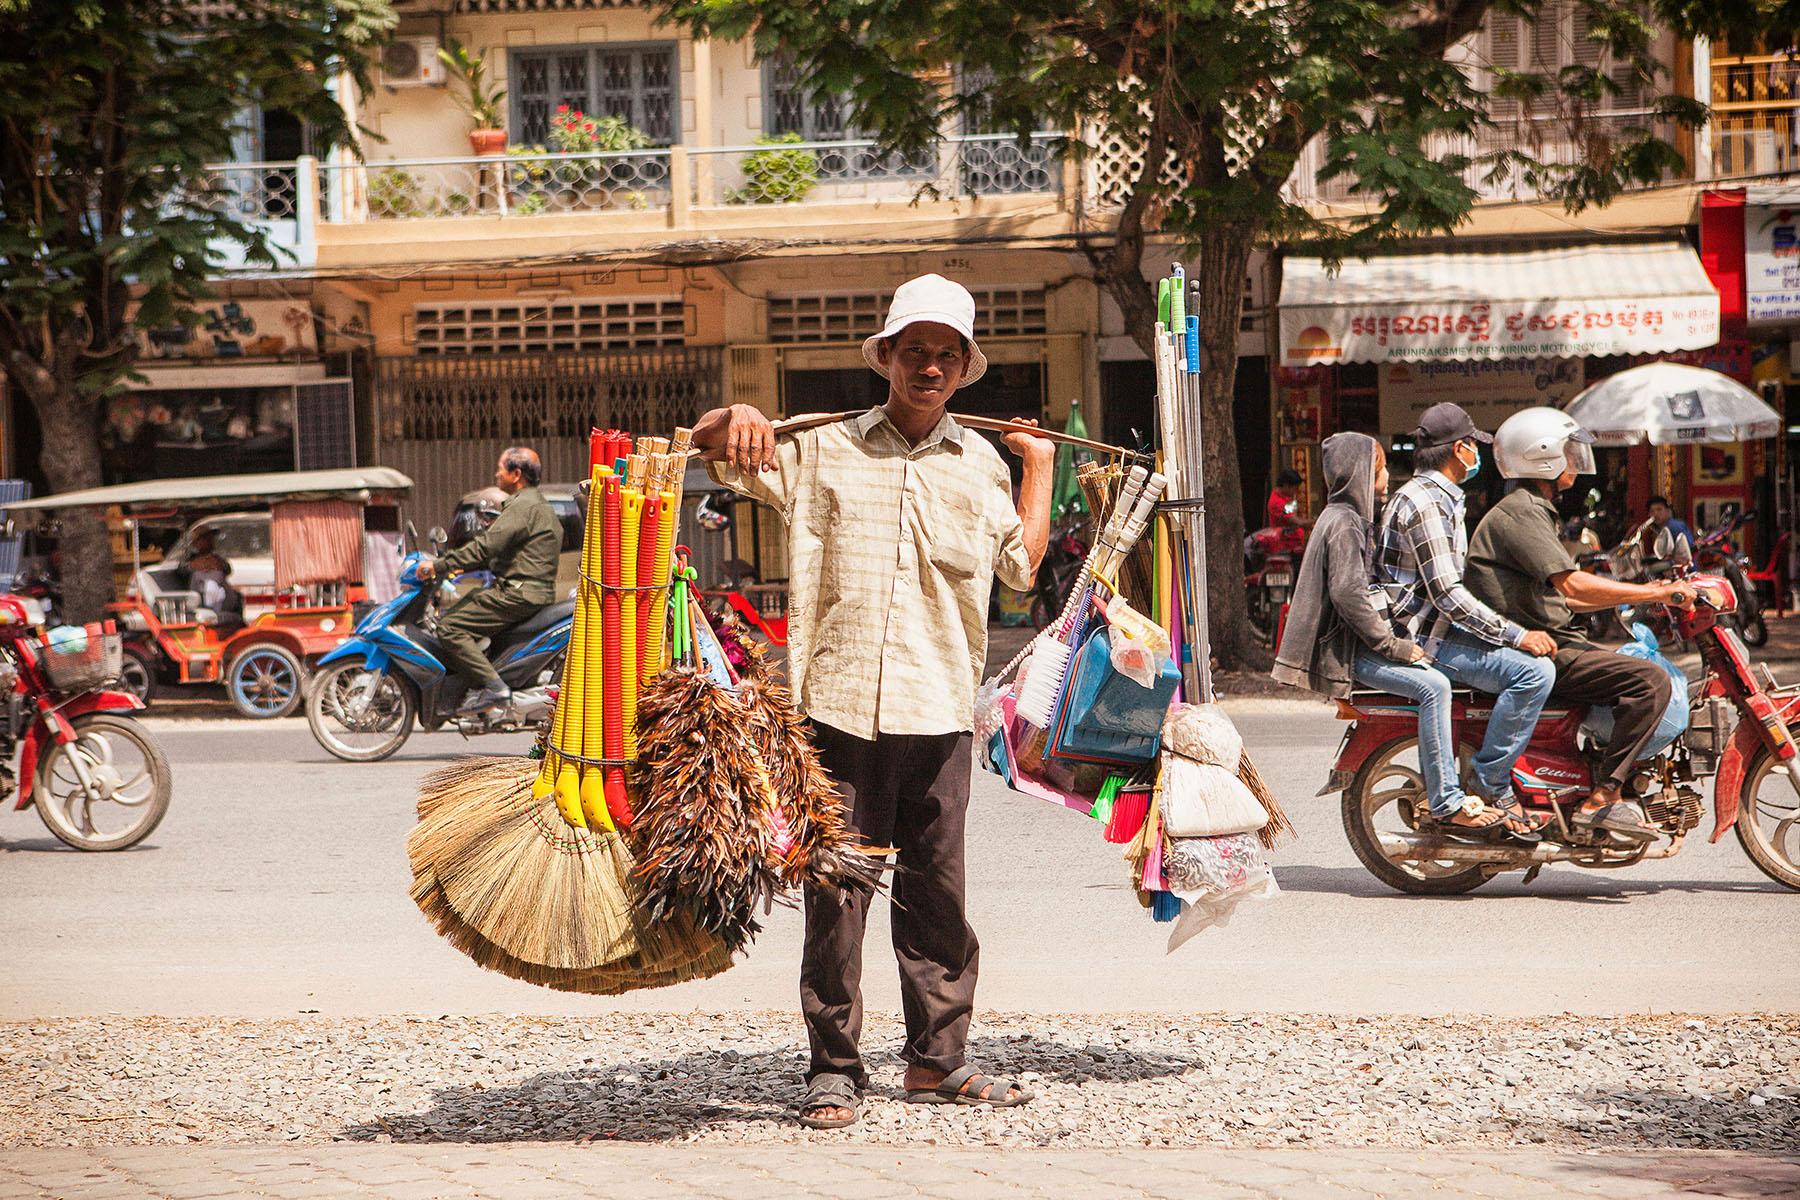 Motopeds_Cambodia-141.jpg